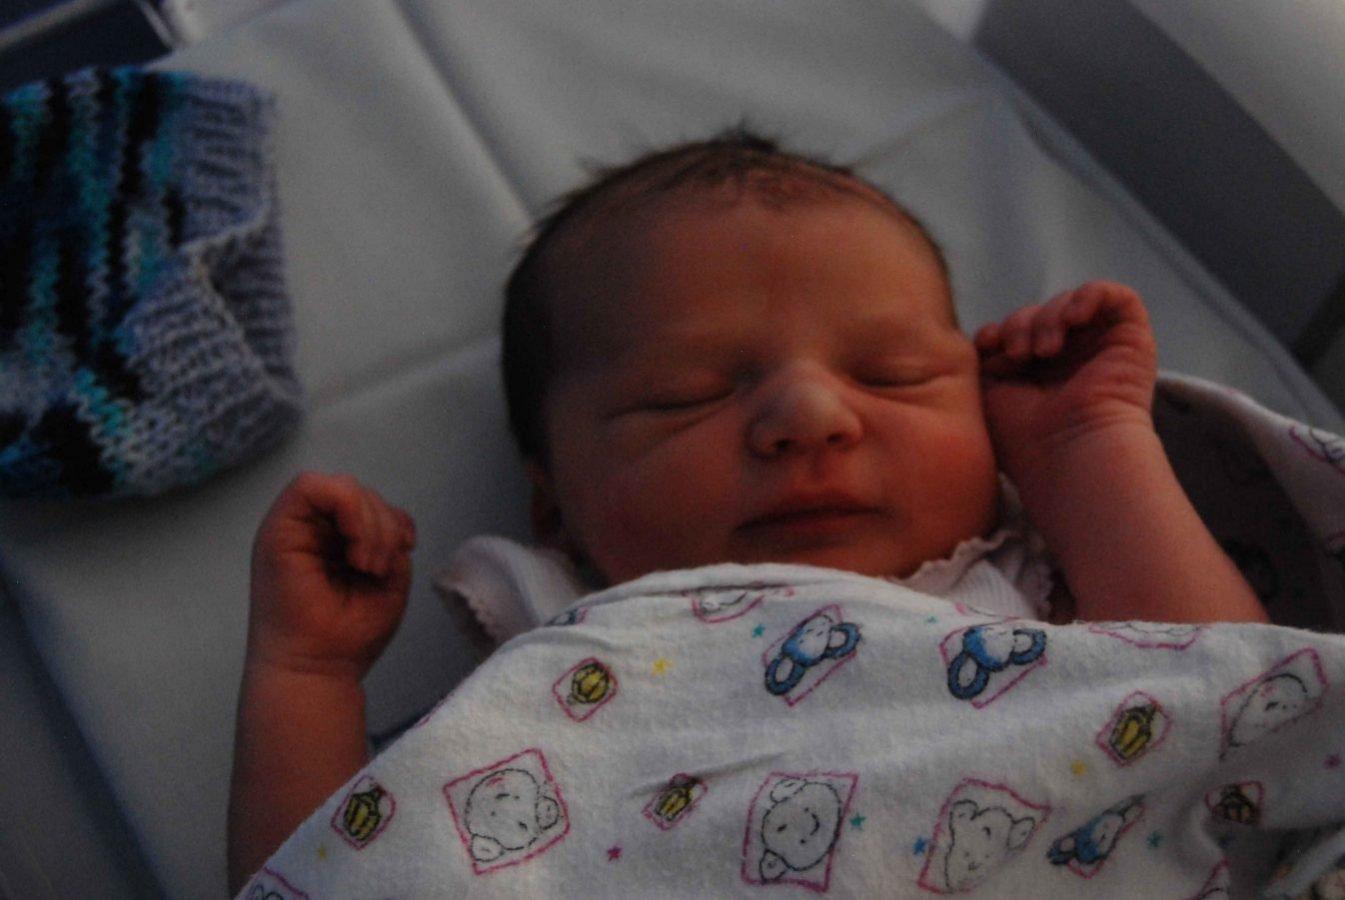 Harley born June 7th 2015